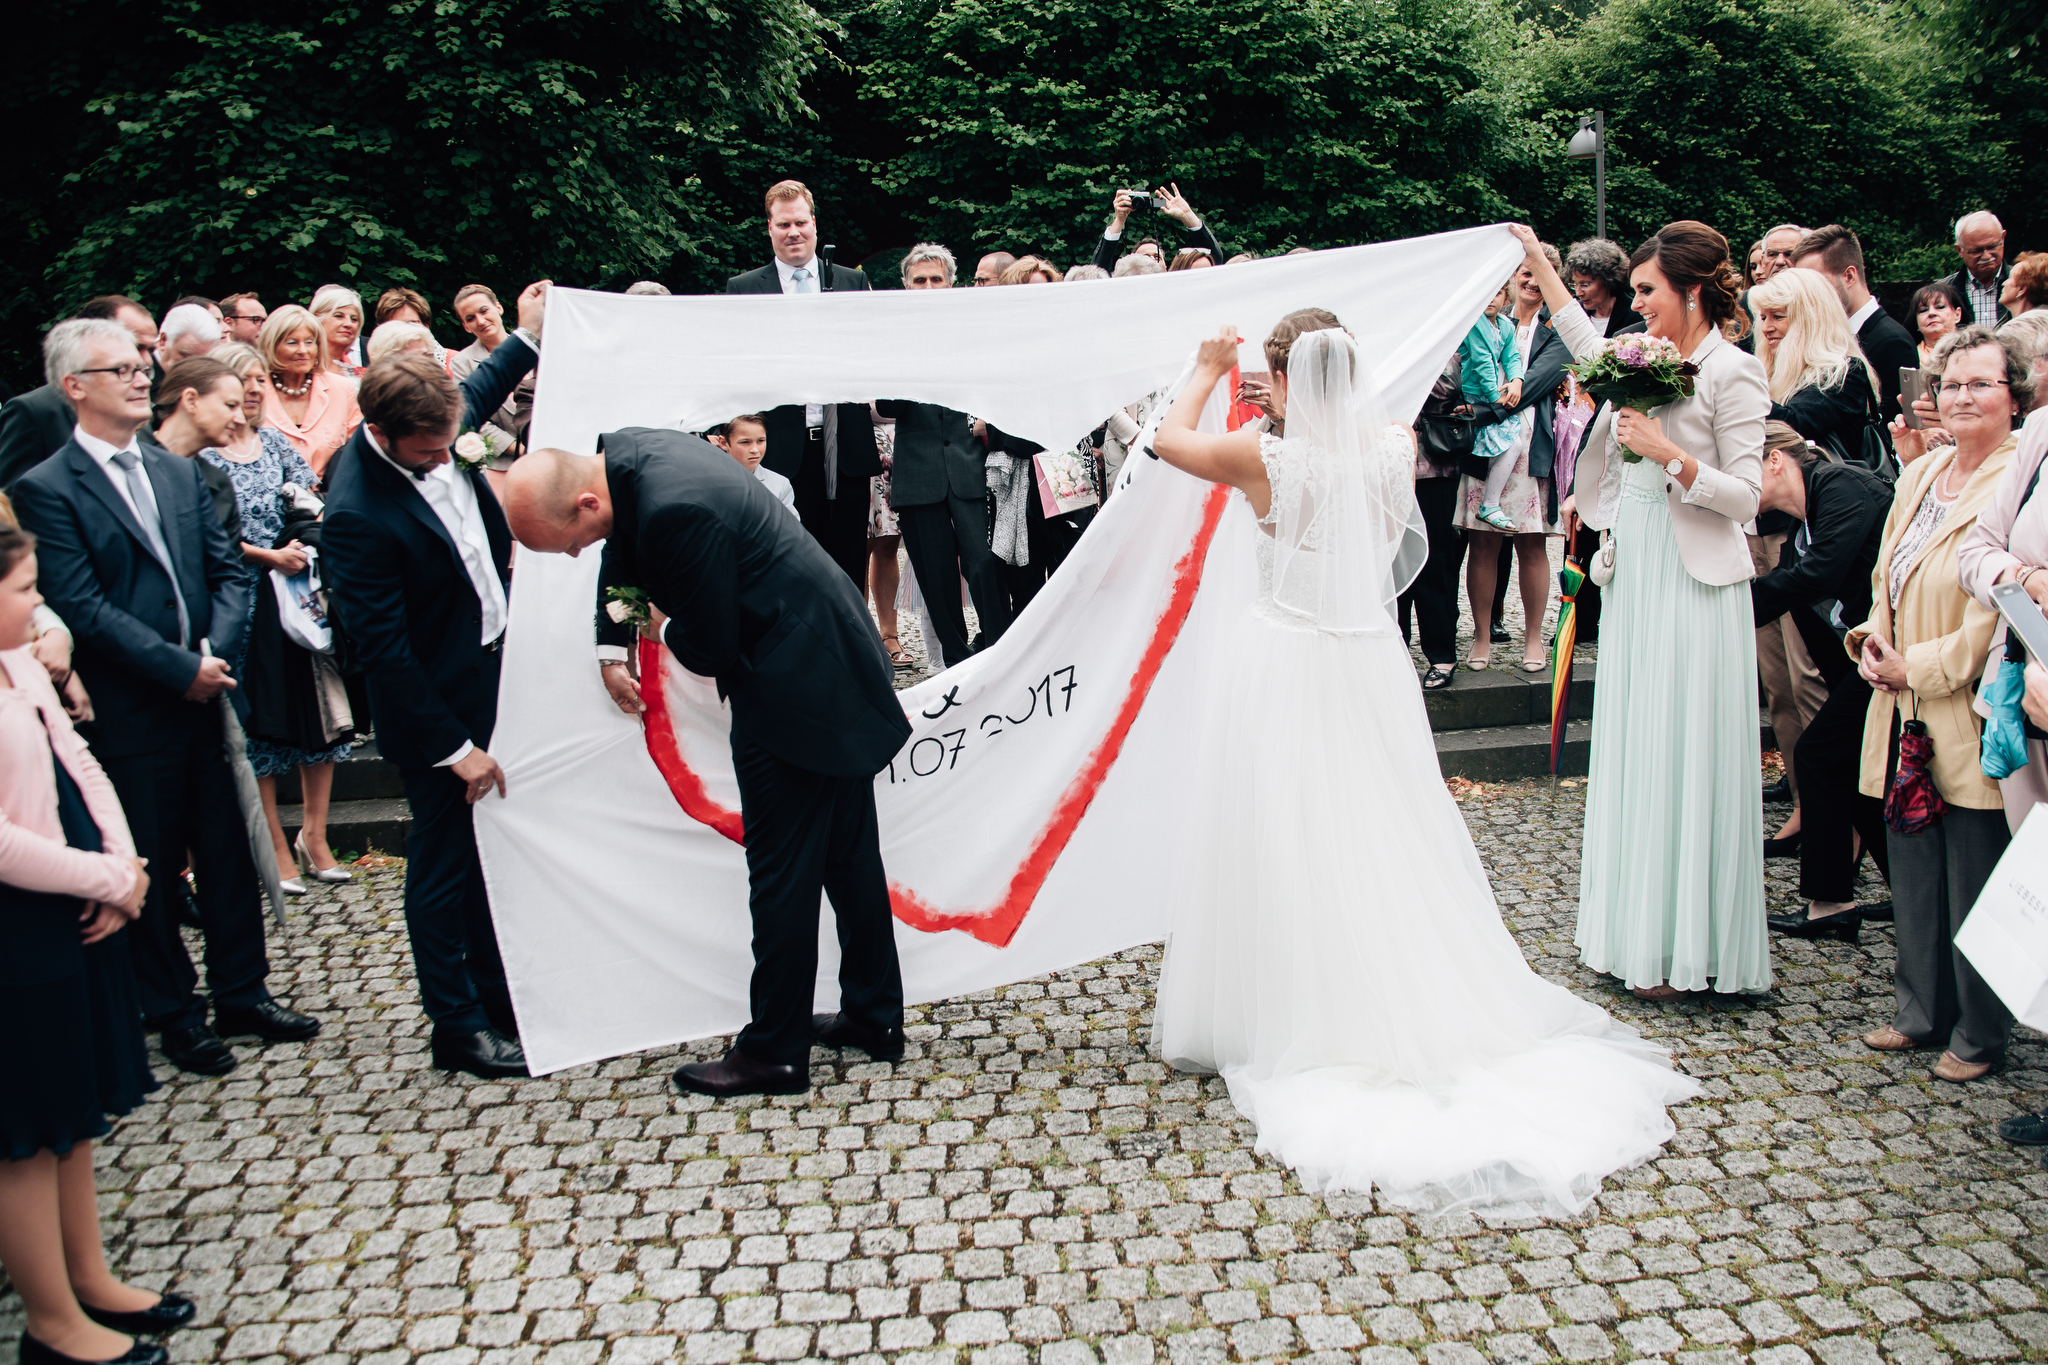 Claudia Krawinkel Fotografie Hochzeitsfotograf Essen Düsseldorf Dormagen Kloster Knechtsteden Hochzeitsreportage Hochzeit Knechtsteden90